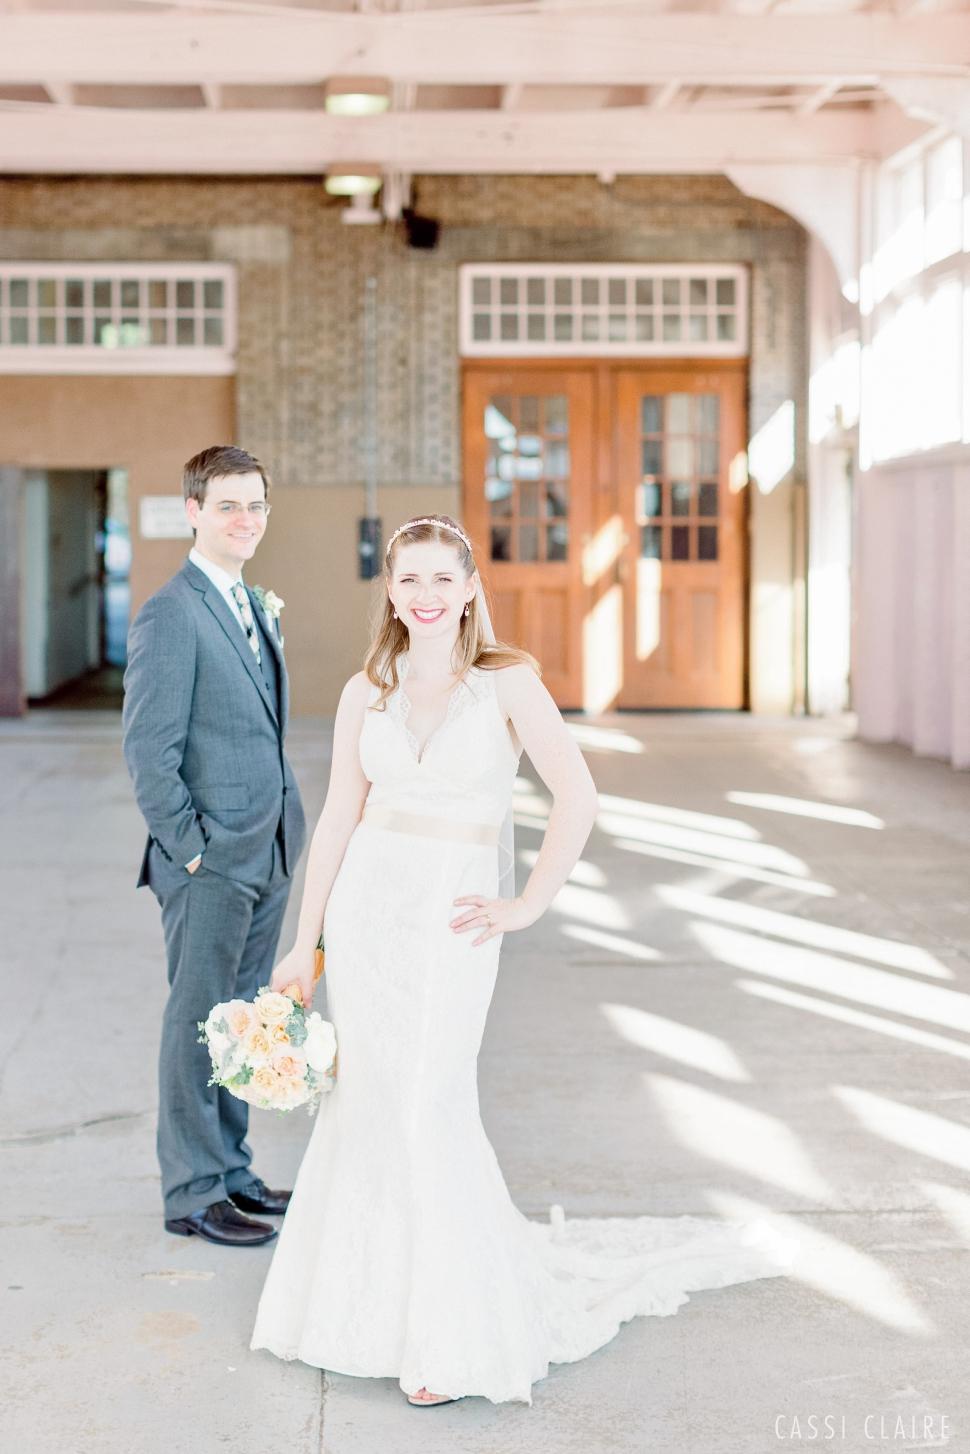 Rhinecliff-Hotel-Wedding-Photos-Hudson-Valley-Wedding-Photographer_17.jpg